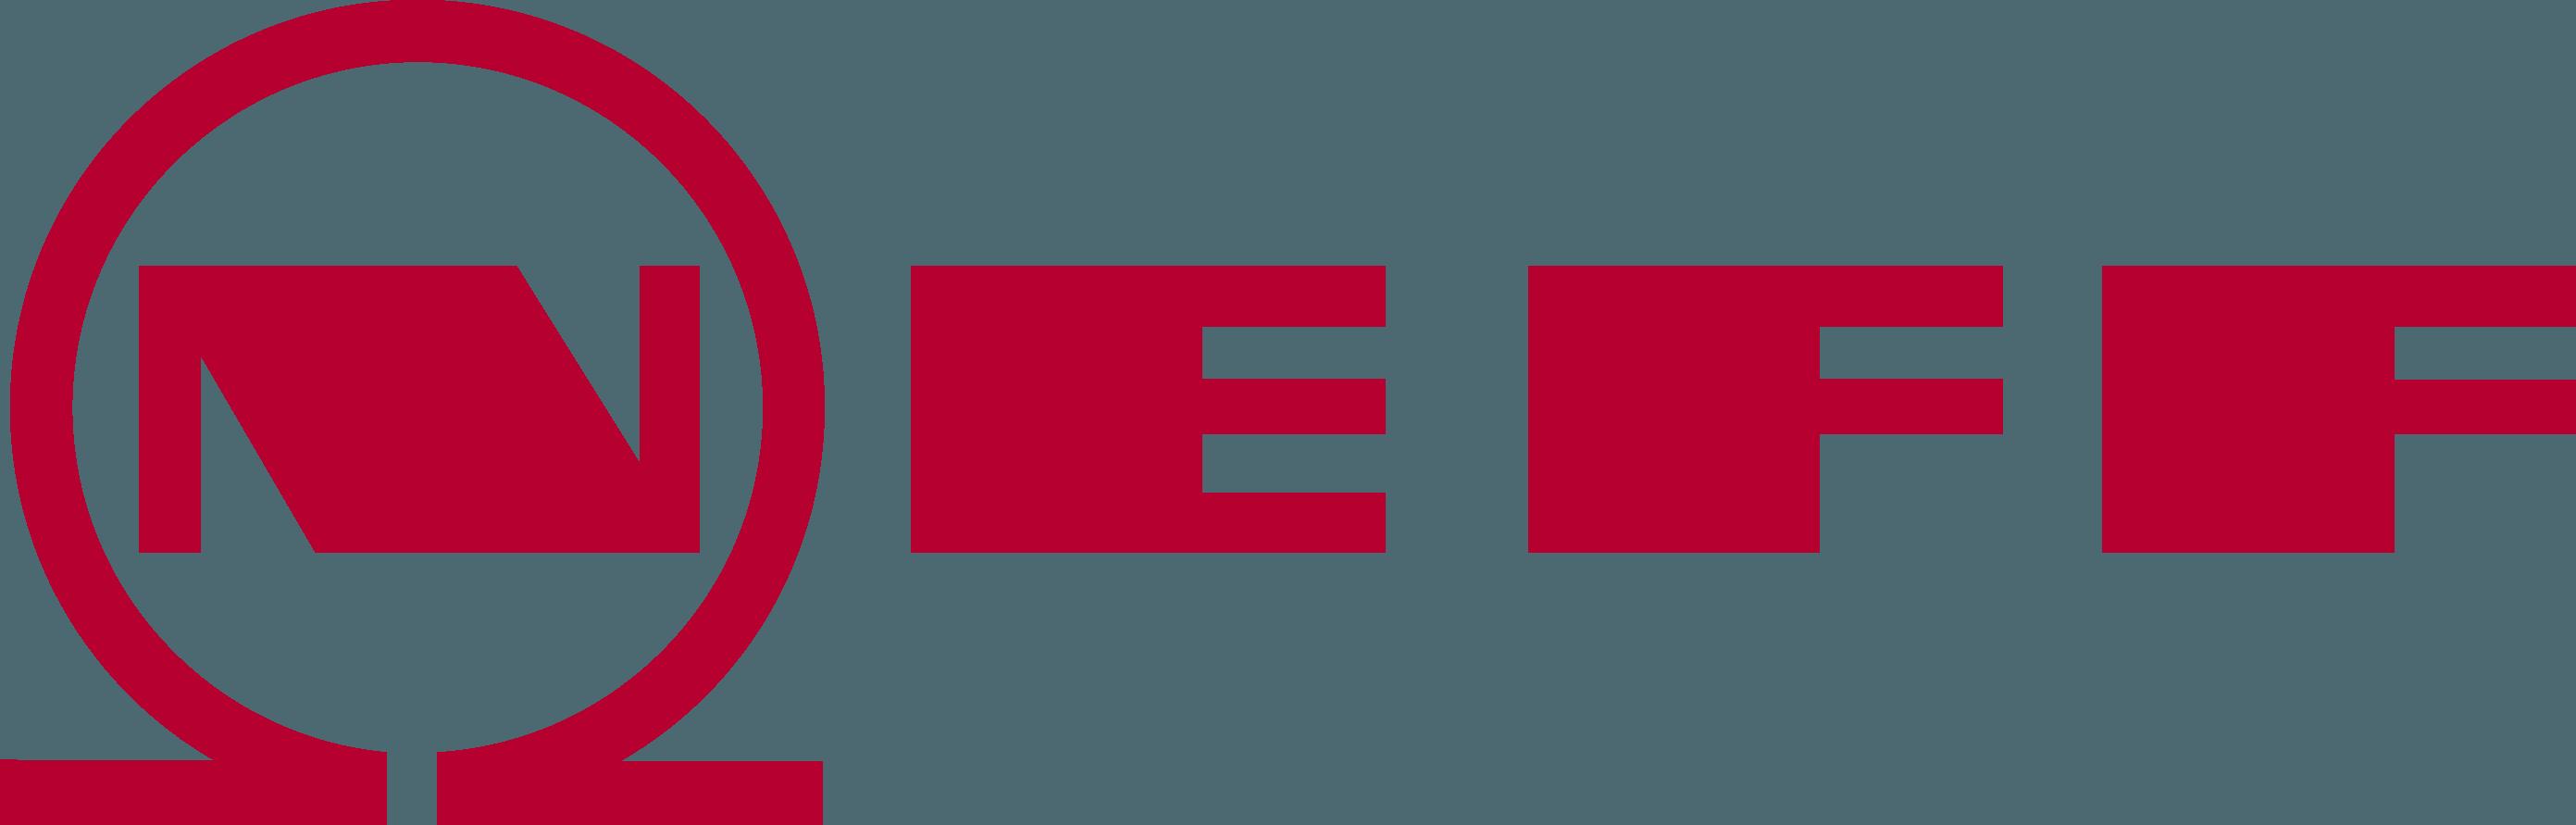 Neff Logo Download Vector.